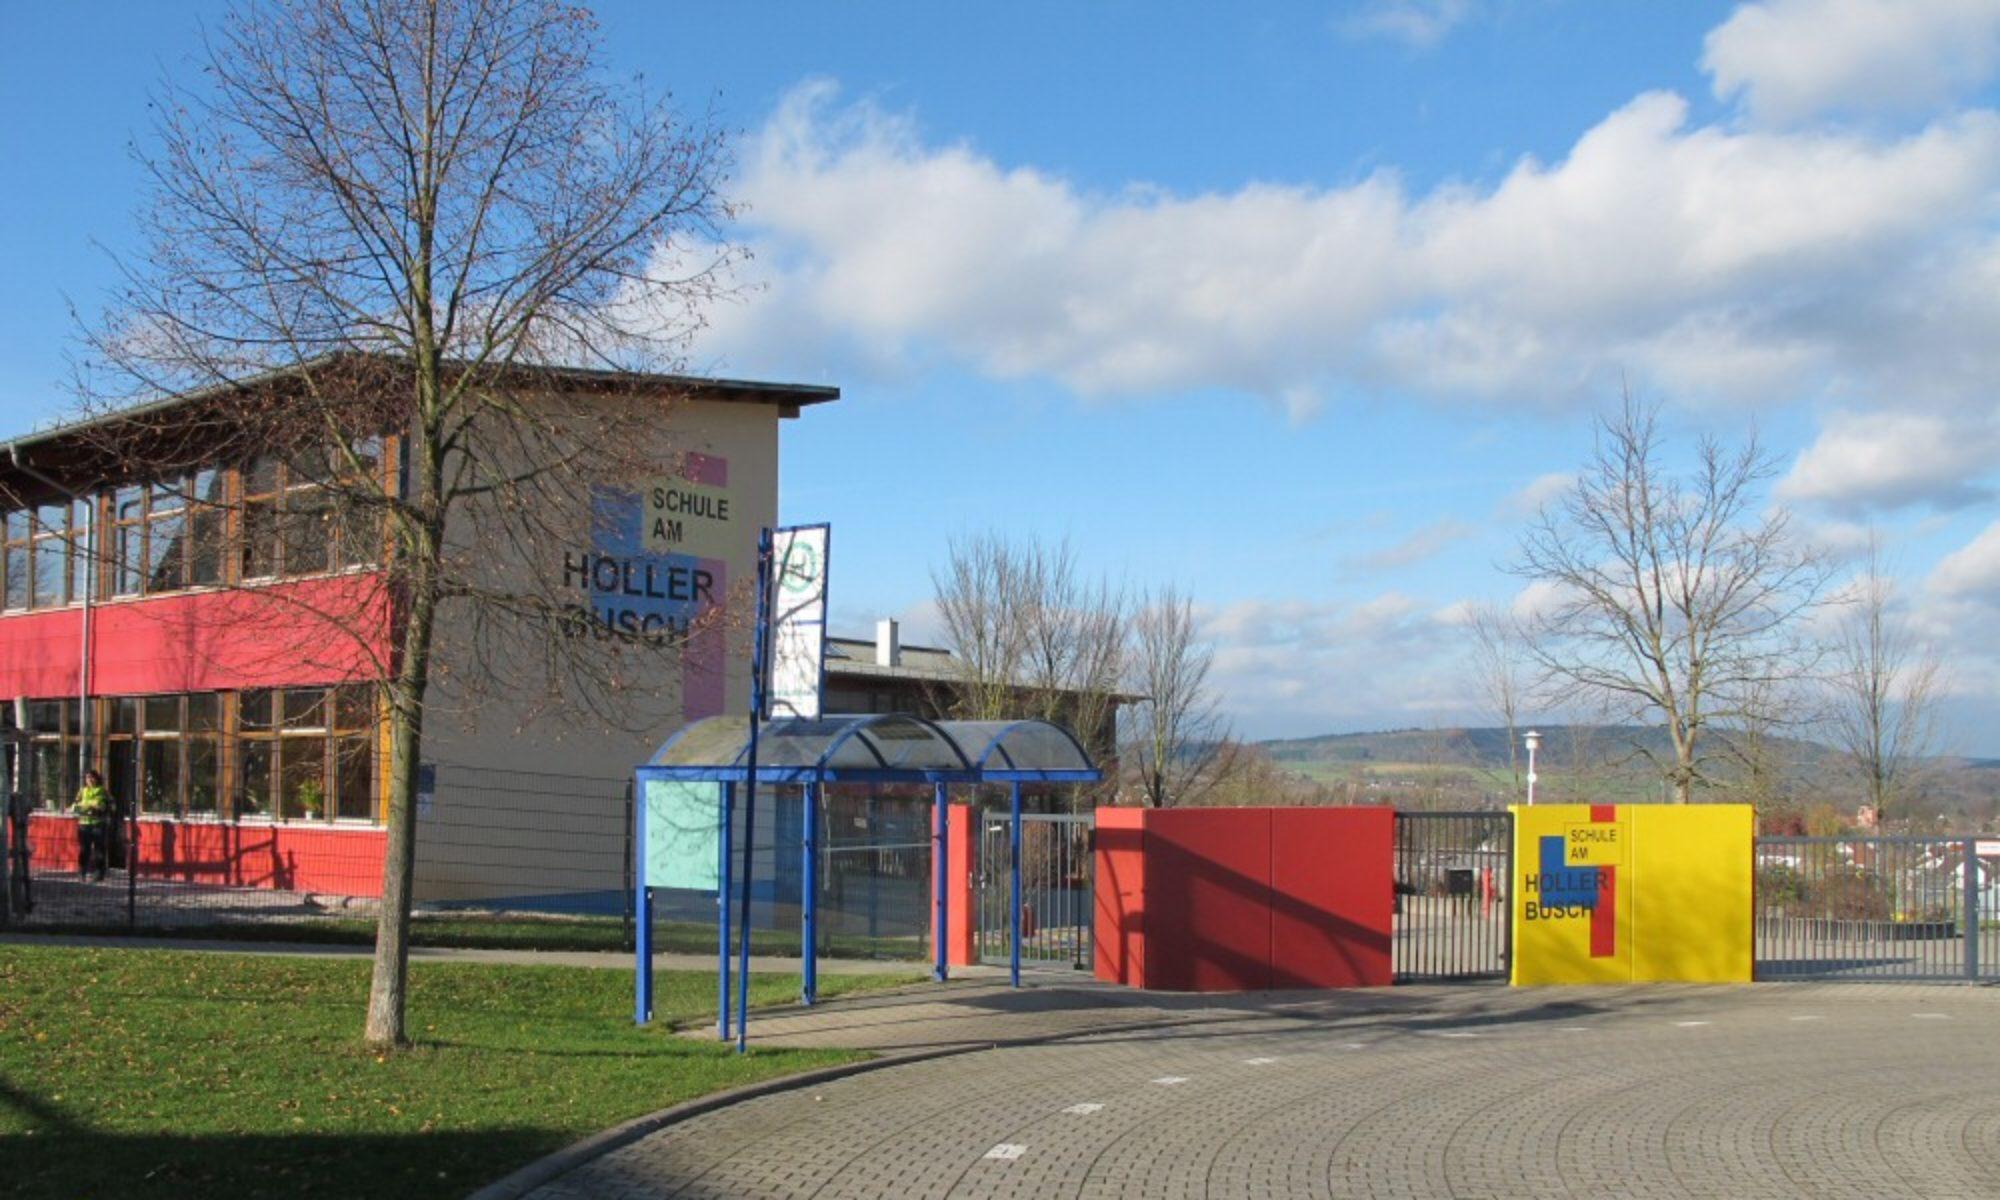 Schule am Hollerbusch